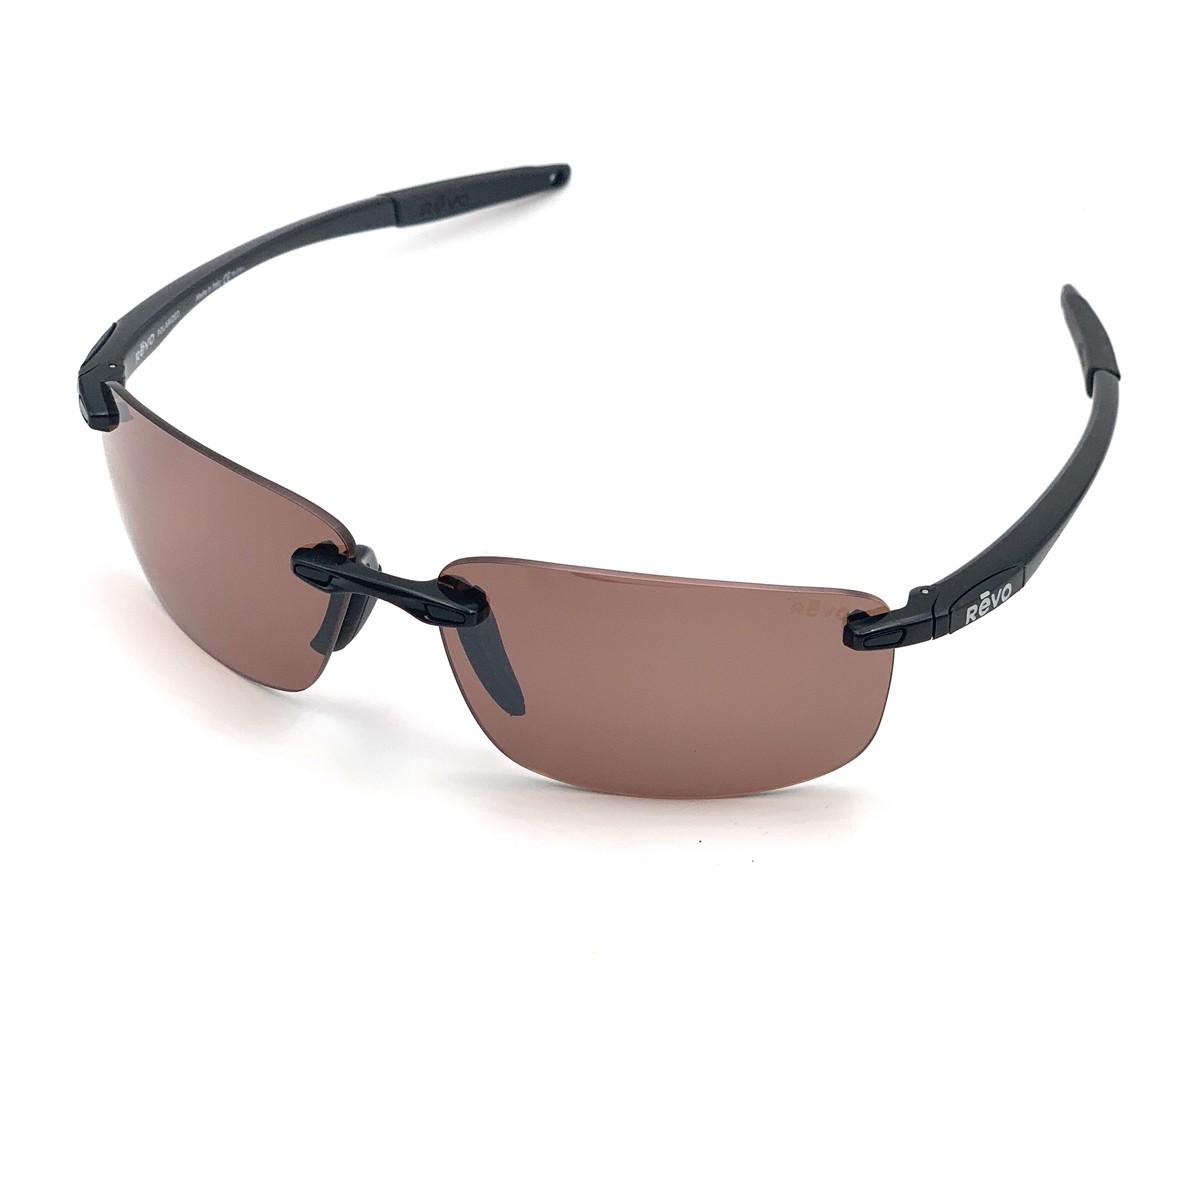 Revo RE 1029 | Men's sunglasses